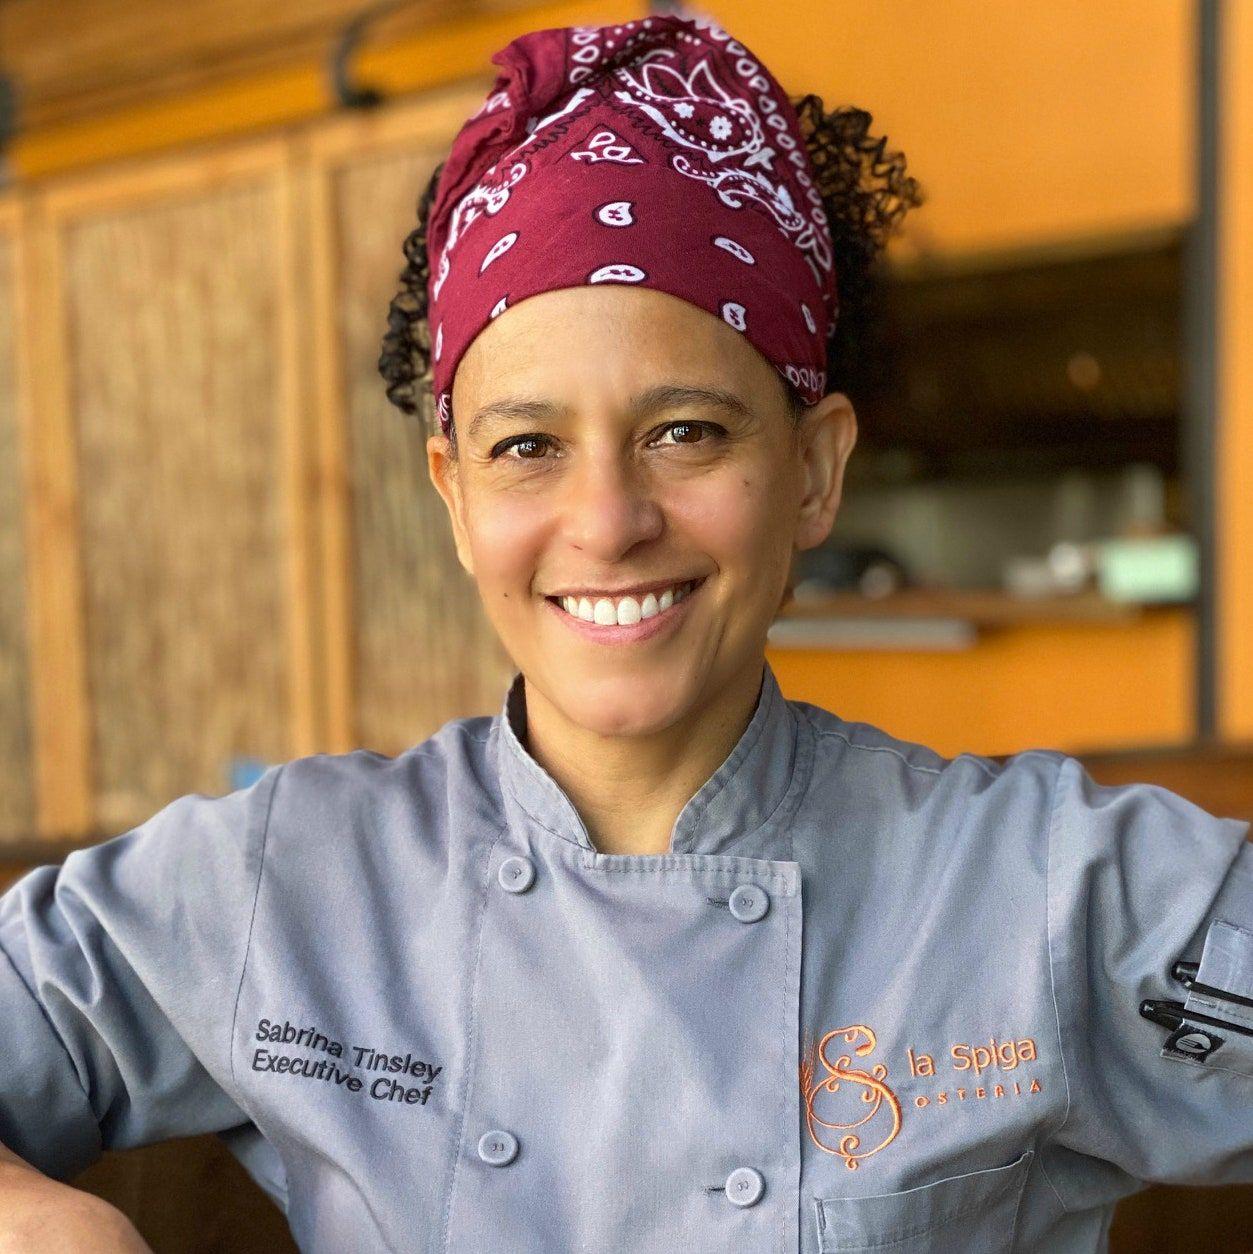 Italian Restaurant La Spiga Celebrates The Soul Of Seattle In 2021 Italian Restaurant Executive Chef Cooking Demonstration